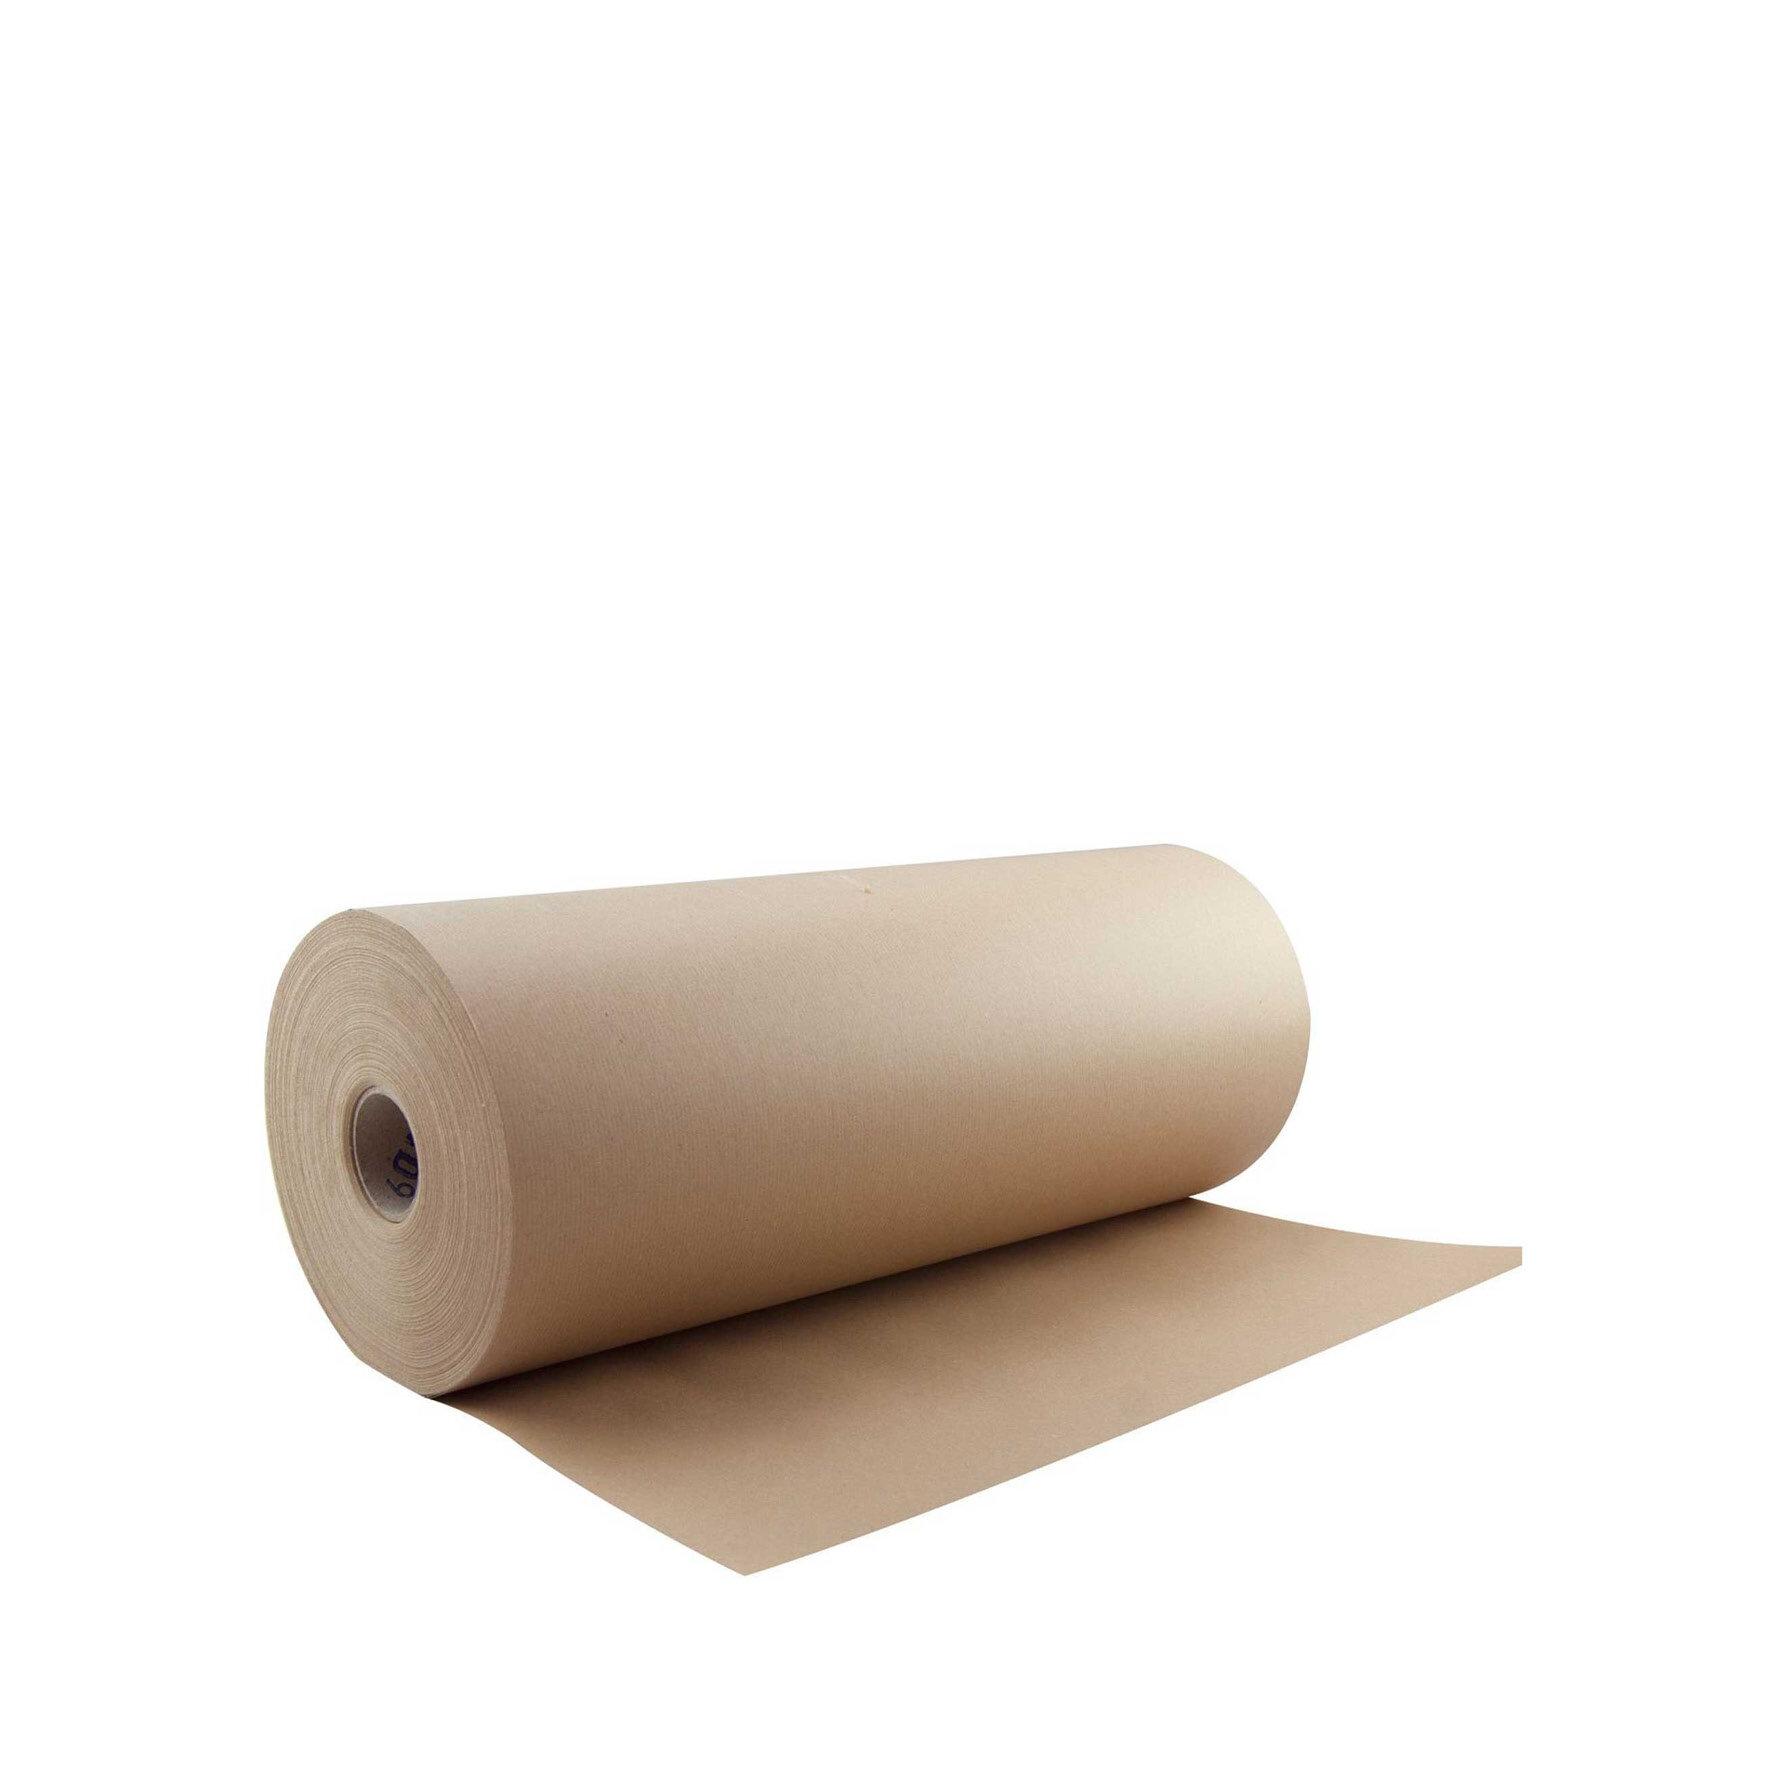 WEBAwrap  Secare Rolle    Papier, geeignet für trockene Lebensmittel, kompostierbar